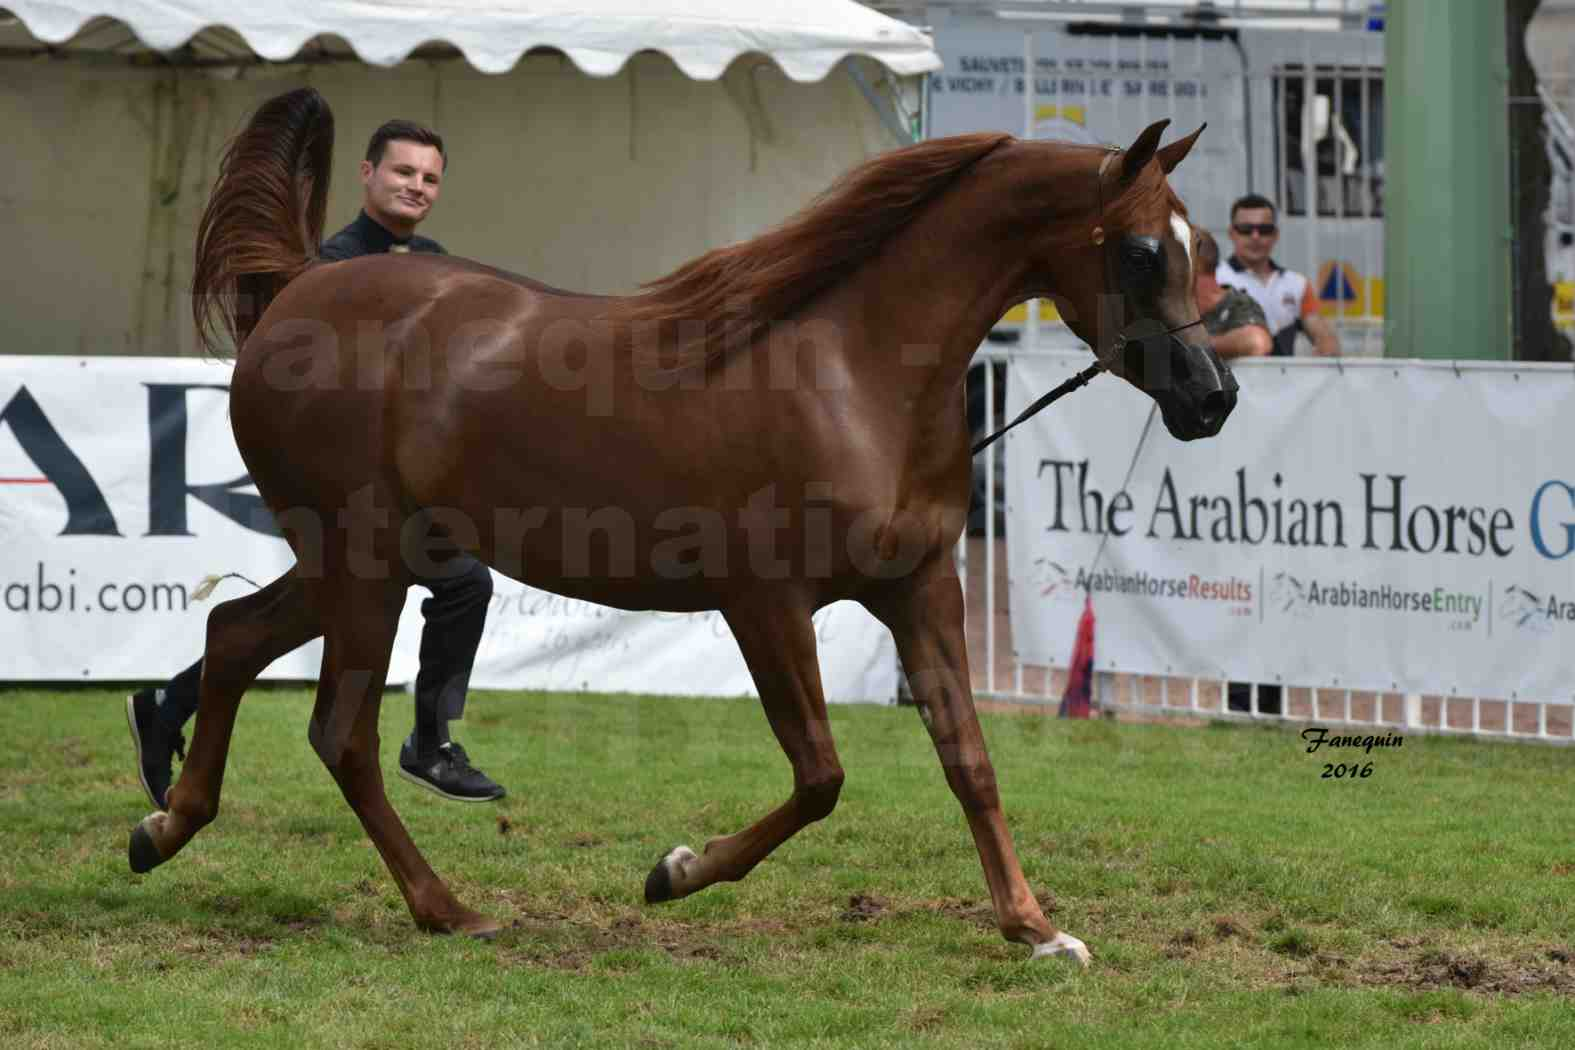 International Arabian Horse Show B de VICHY 2016 - PEARL DE DJOON - Notre Sélection - 24